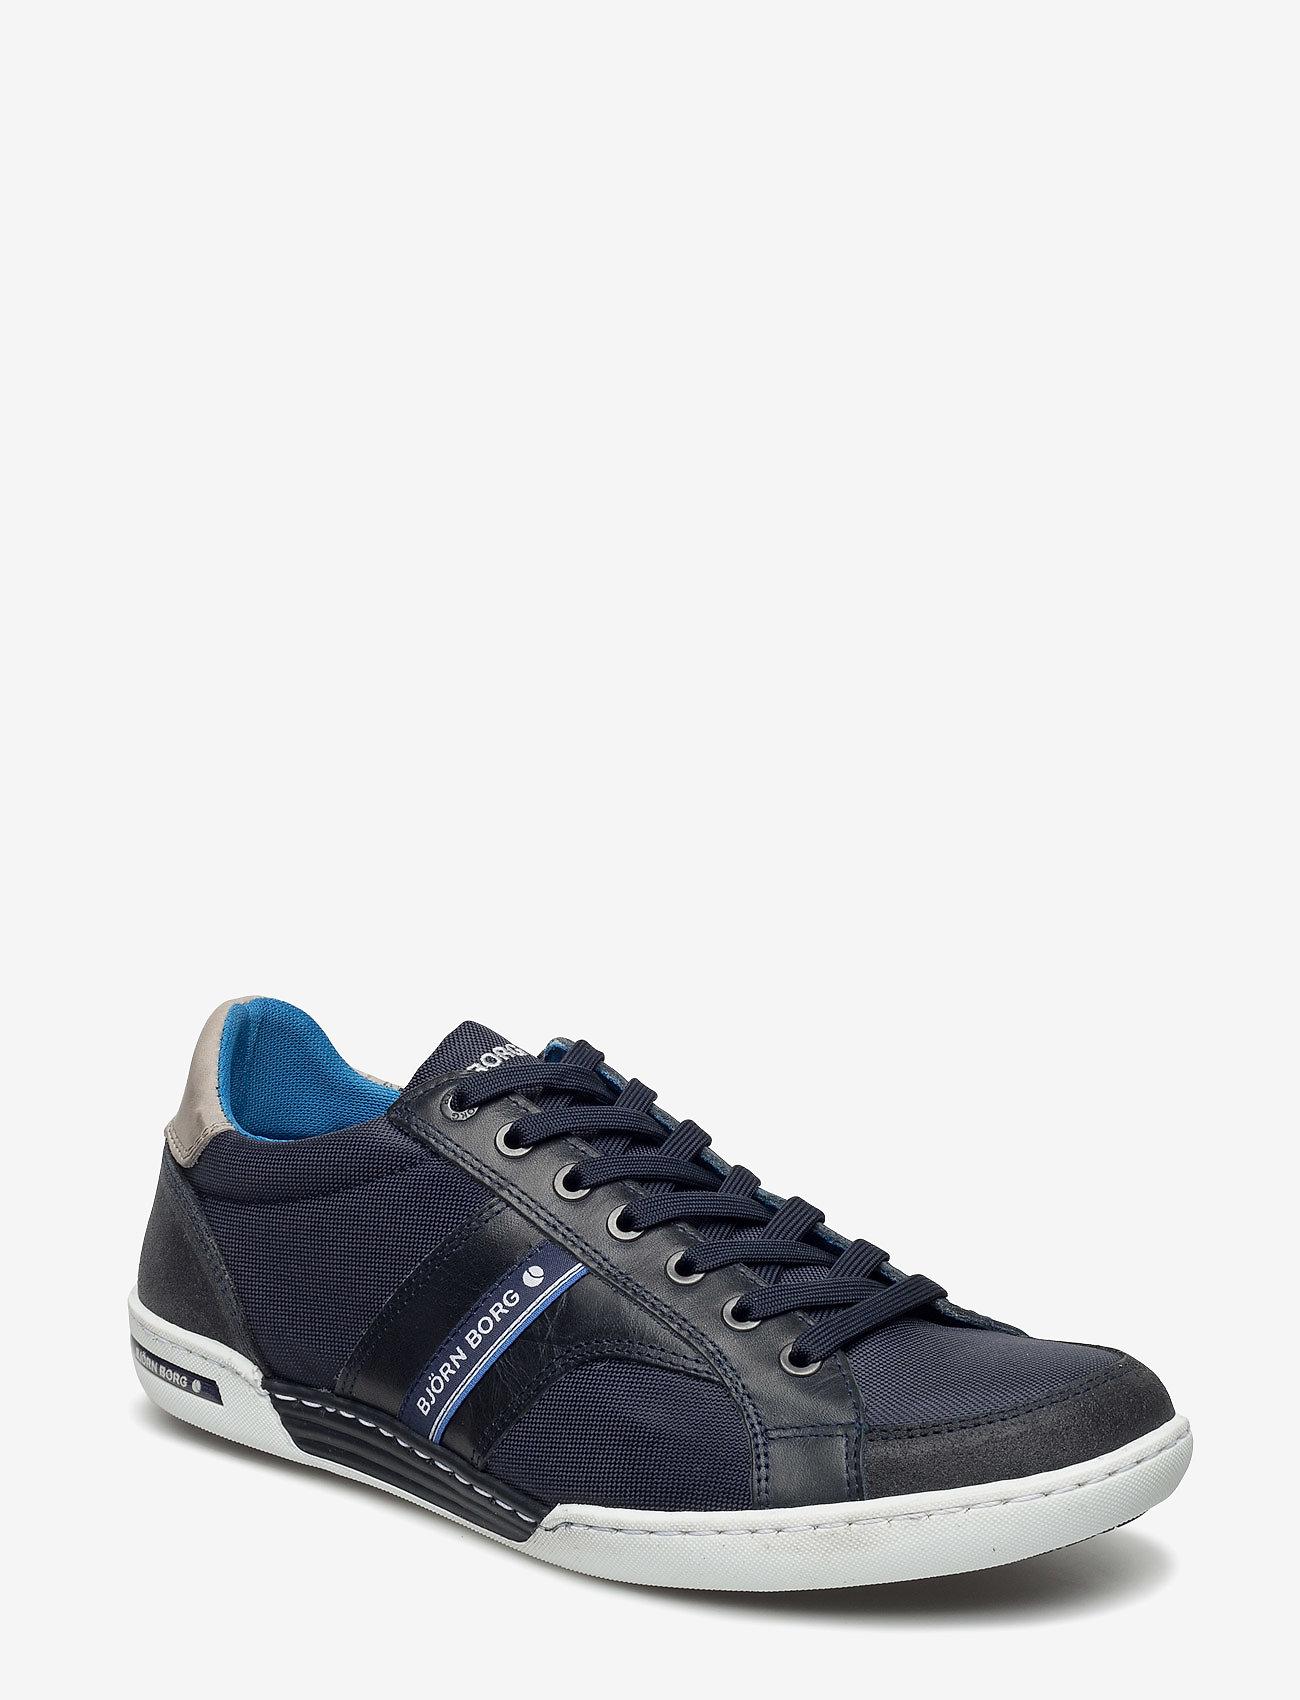 Björn Borg - Henry Nnyl - laag sneakers - navy/blue - 0